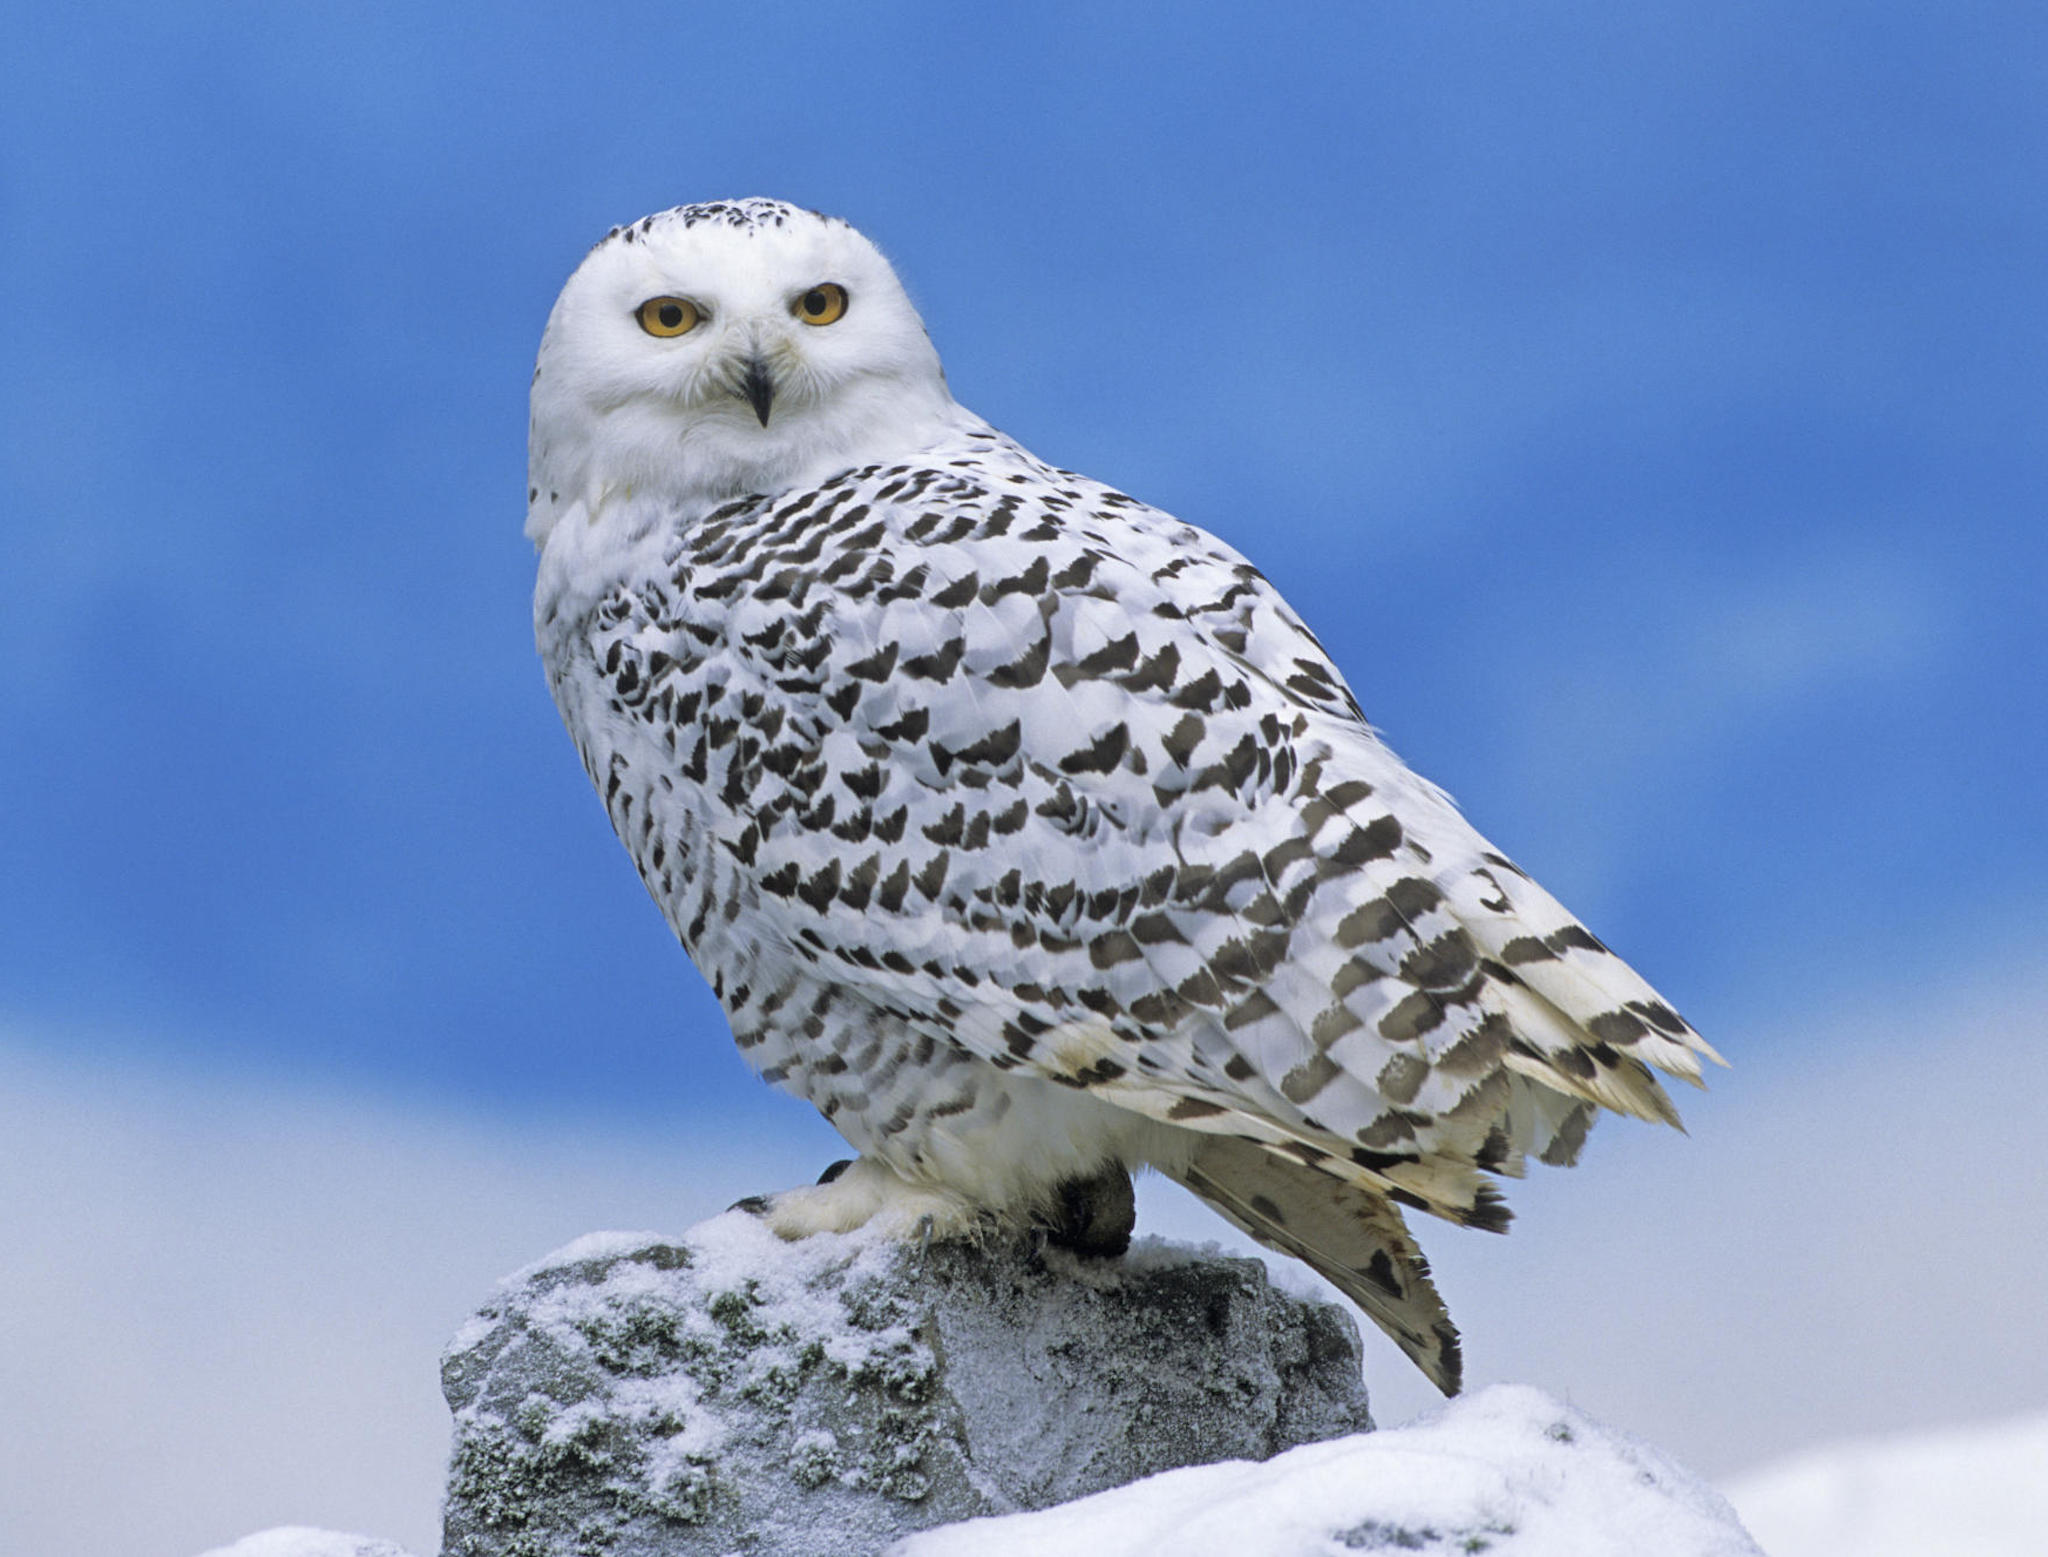 Snowy Owl Perched Wallpaper Free Hd Owl Downloads